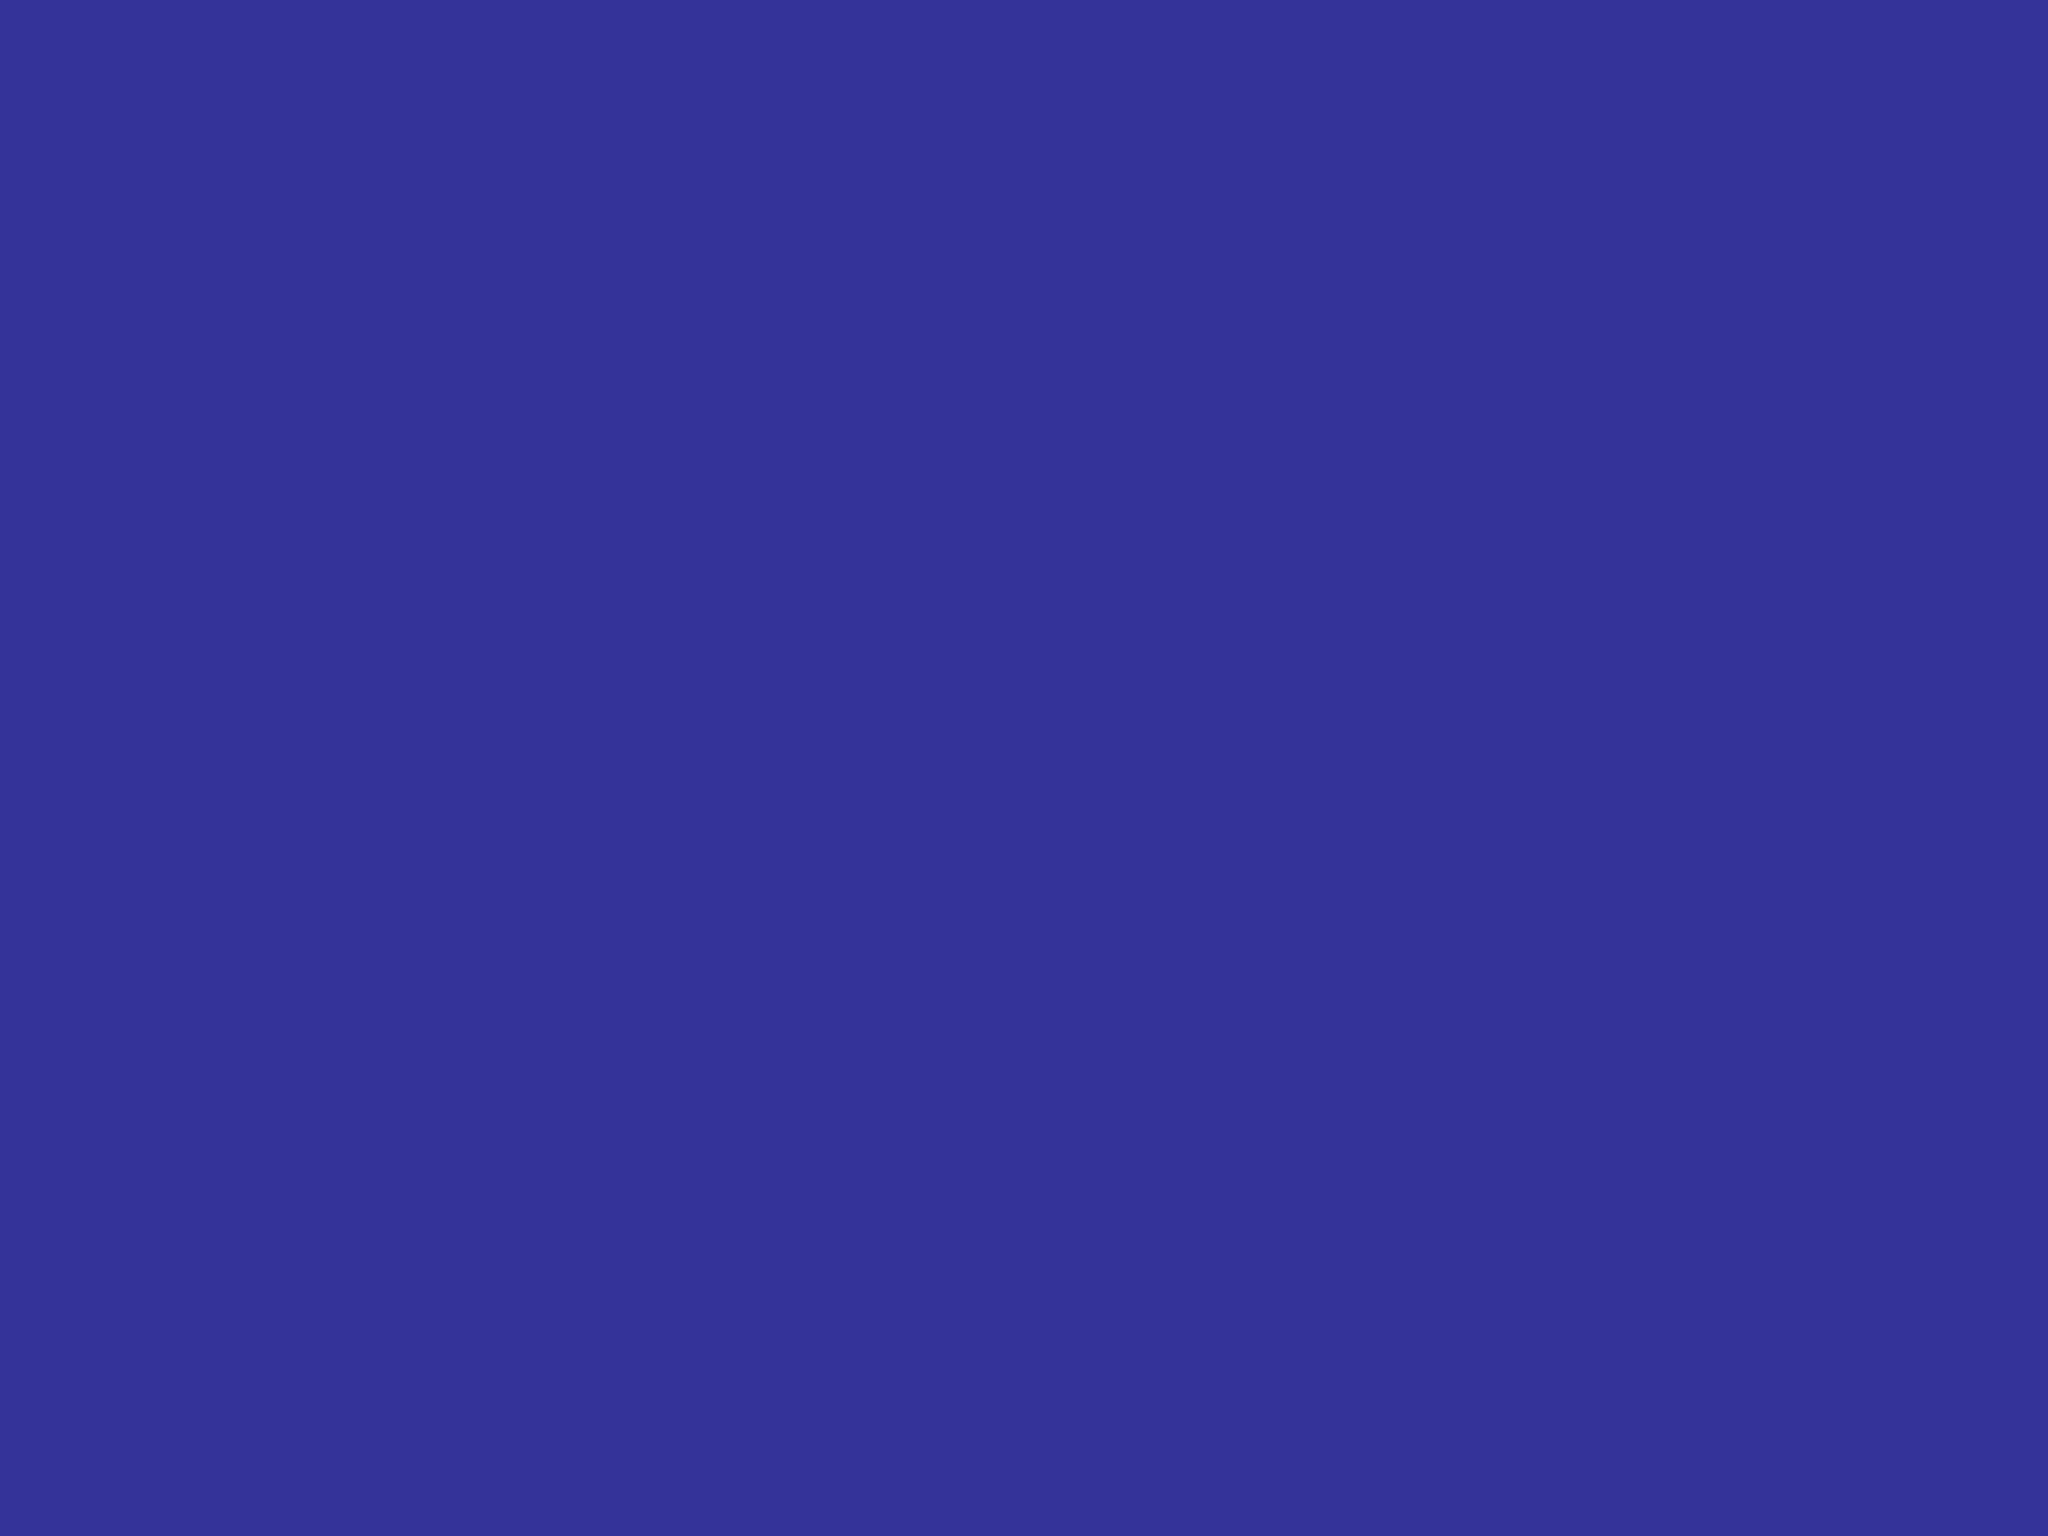 2048x1536 Blue Pigment Solid Color Background